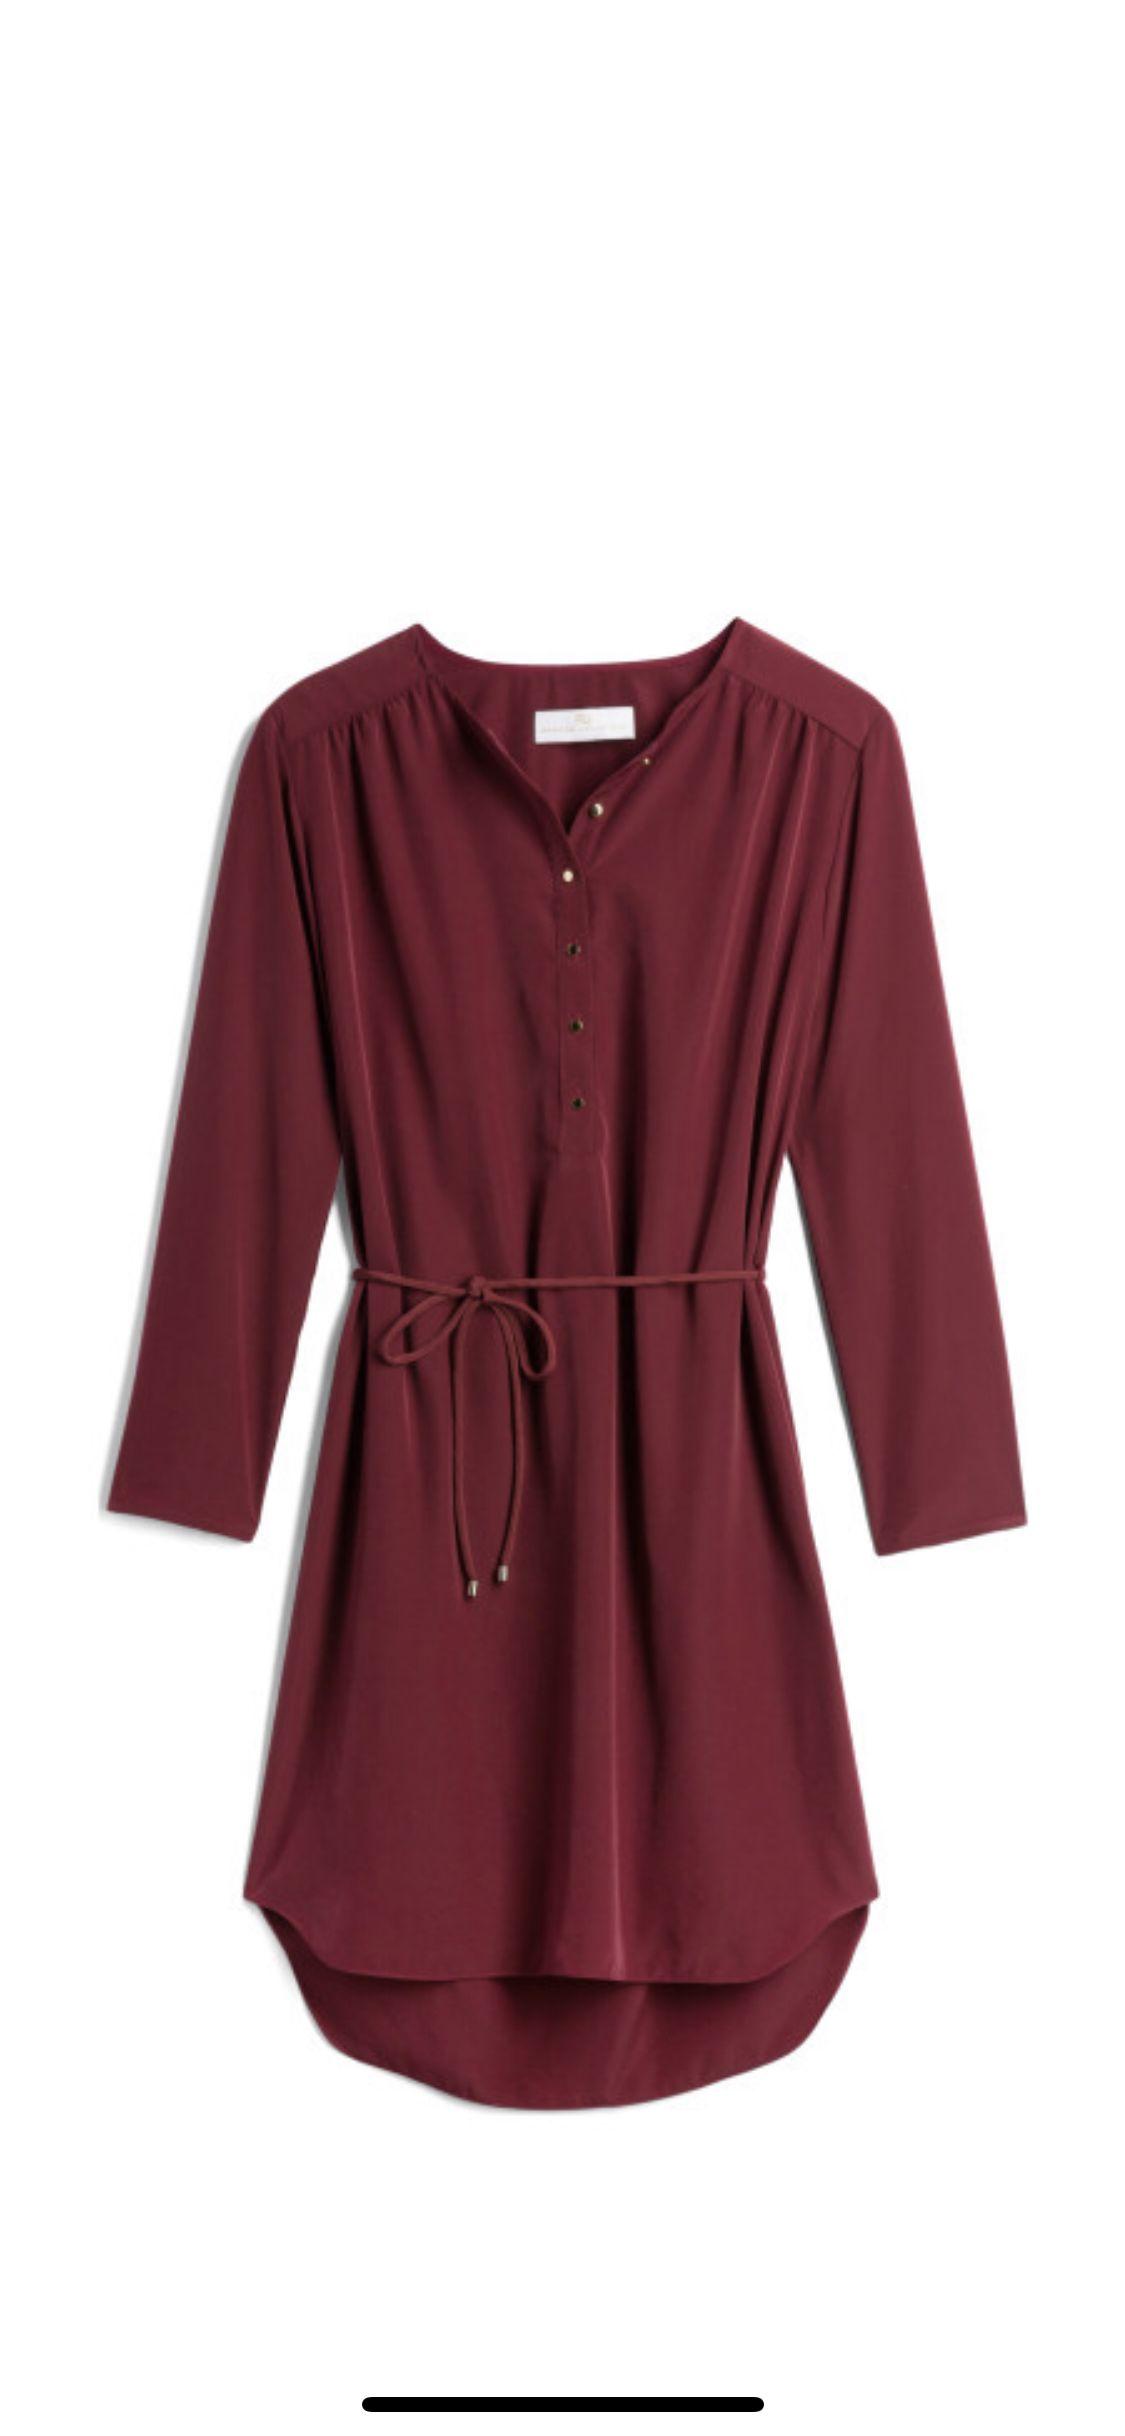 Burgundy shirt dress #stitchfix